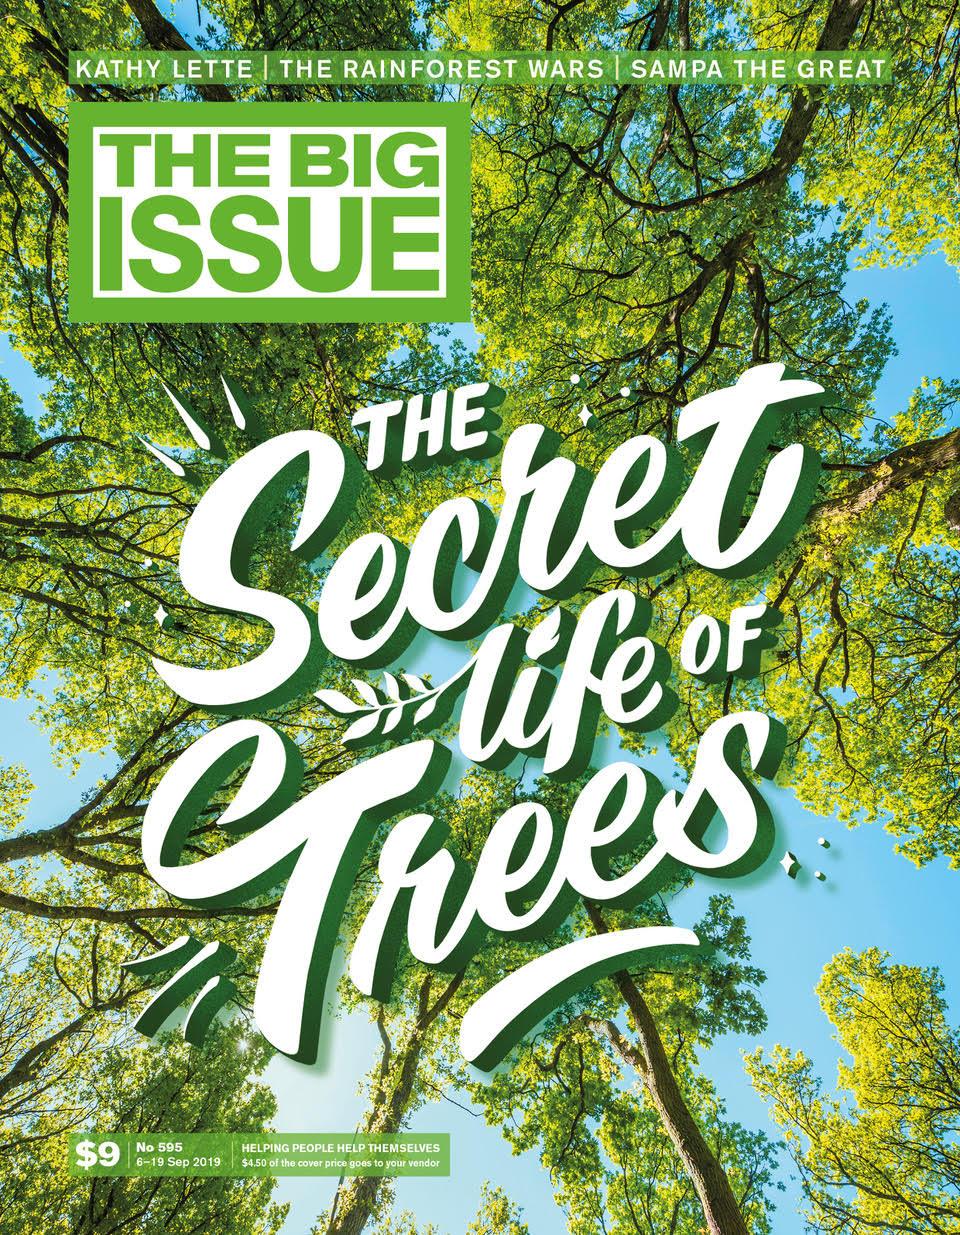 TheBigIssue_Trees_Cover.jpg